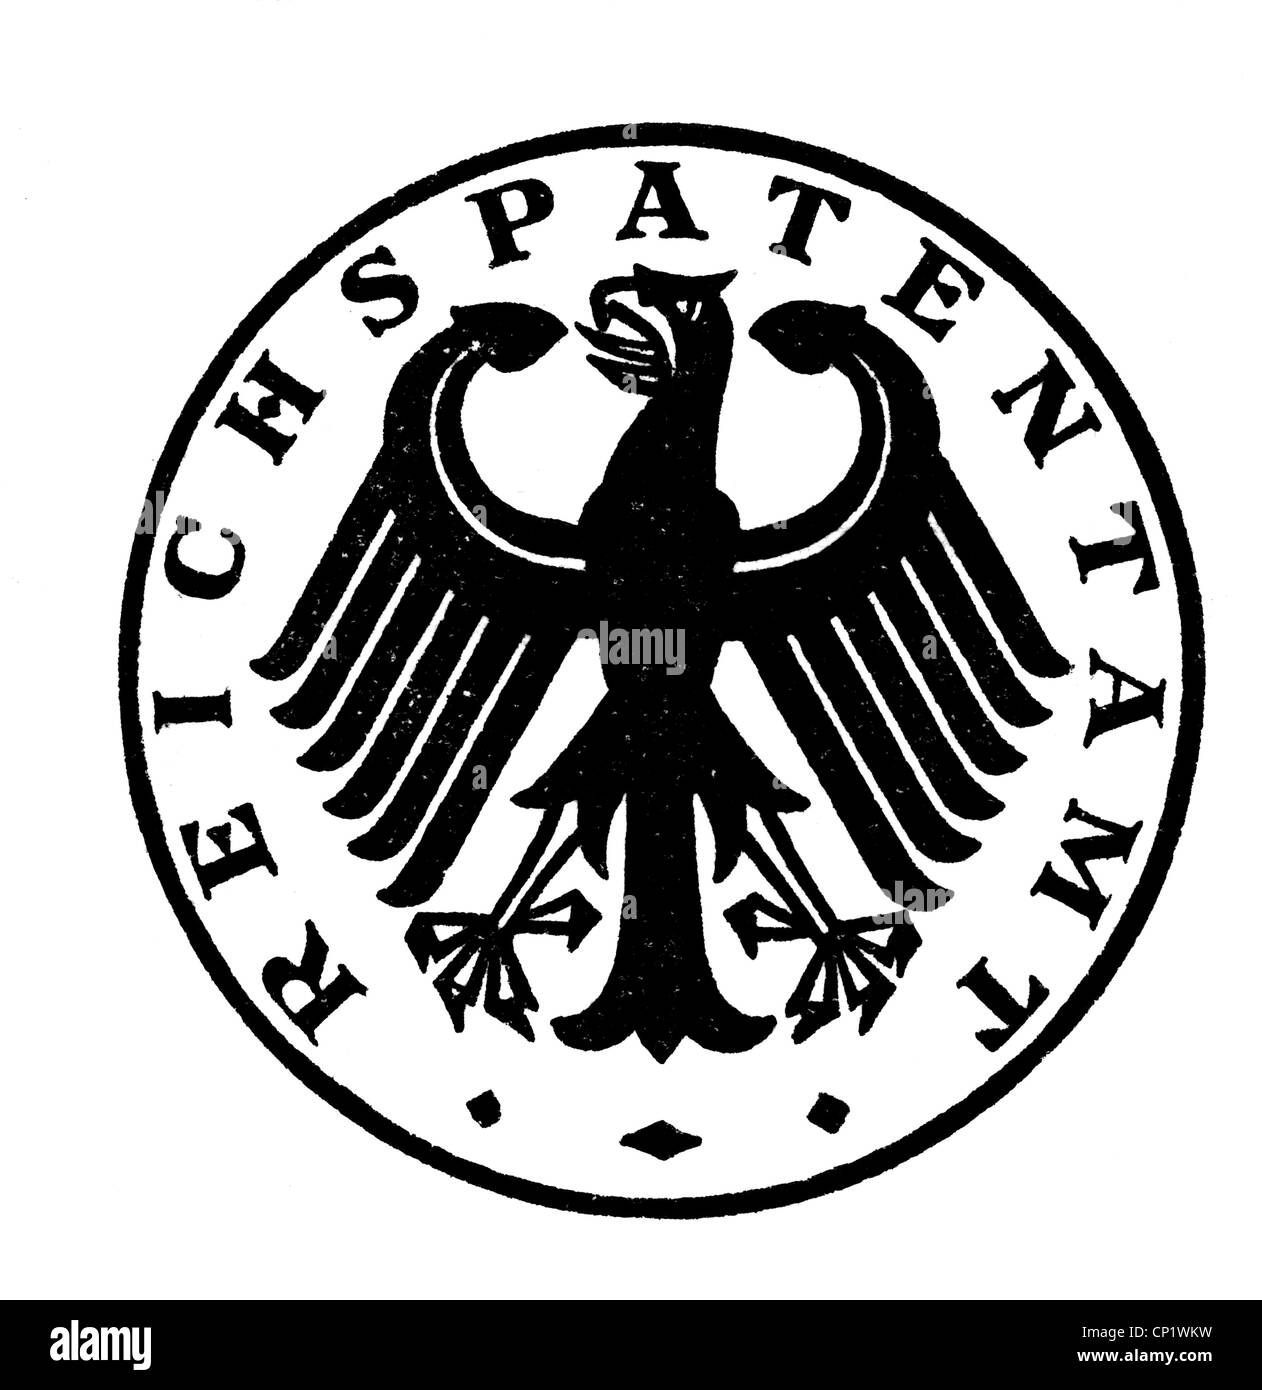 oval office carpet eagle. Heraldry, Seal, Reichspatentamt (Reich Patent Office), 1919 - 1945, Official Oval Office Carpet Eagle S